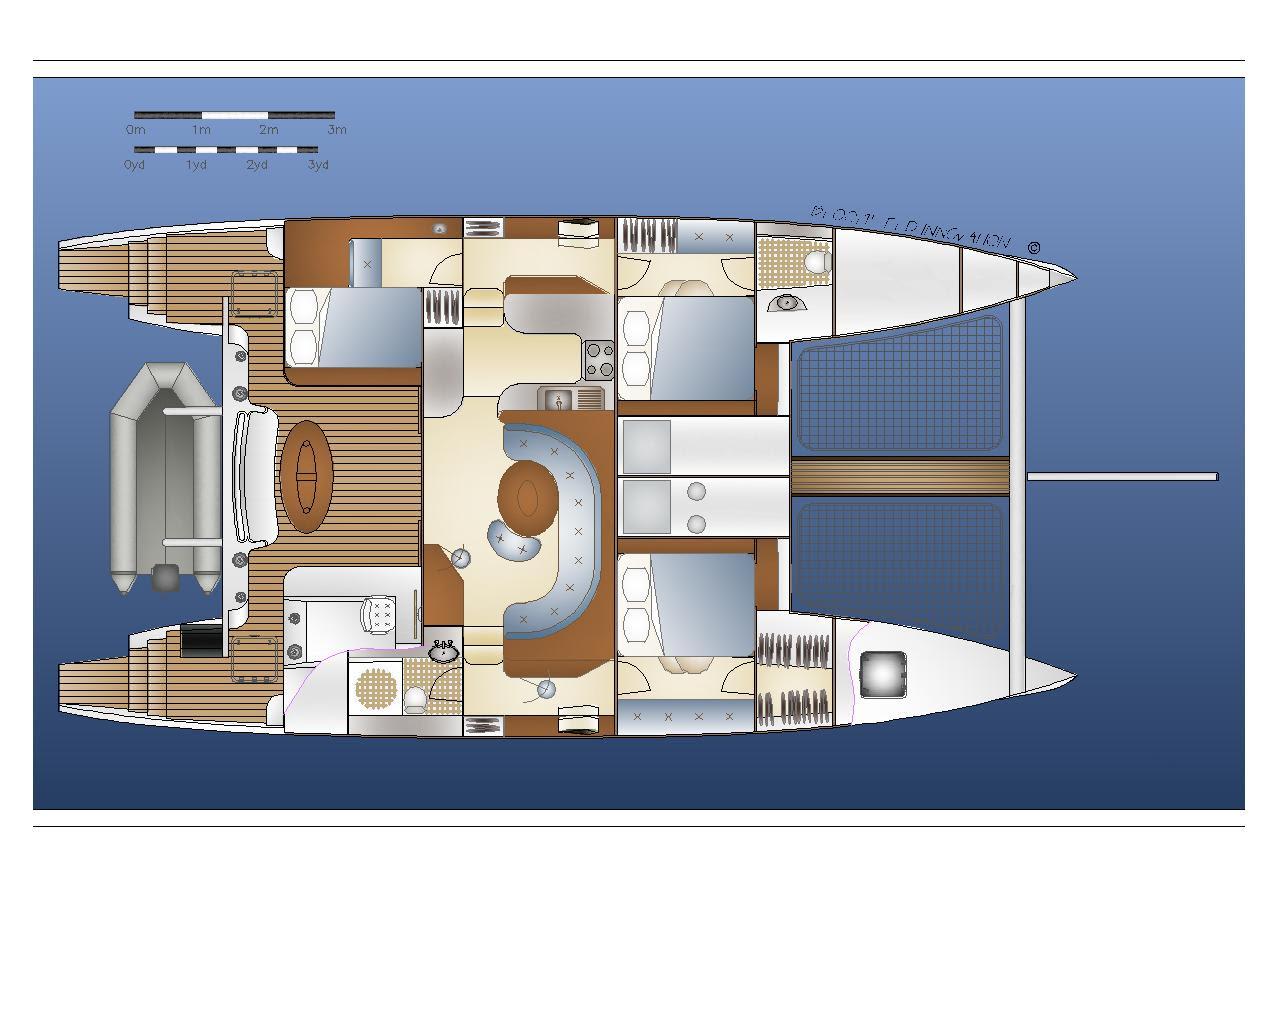 catamaran plans wooden boat plans homemade catamaran boat plans free